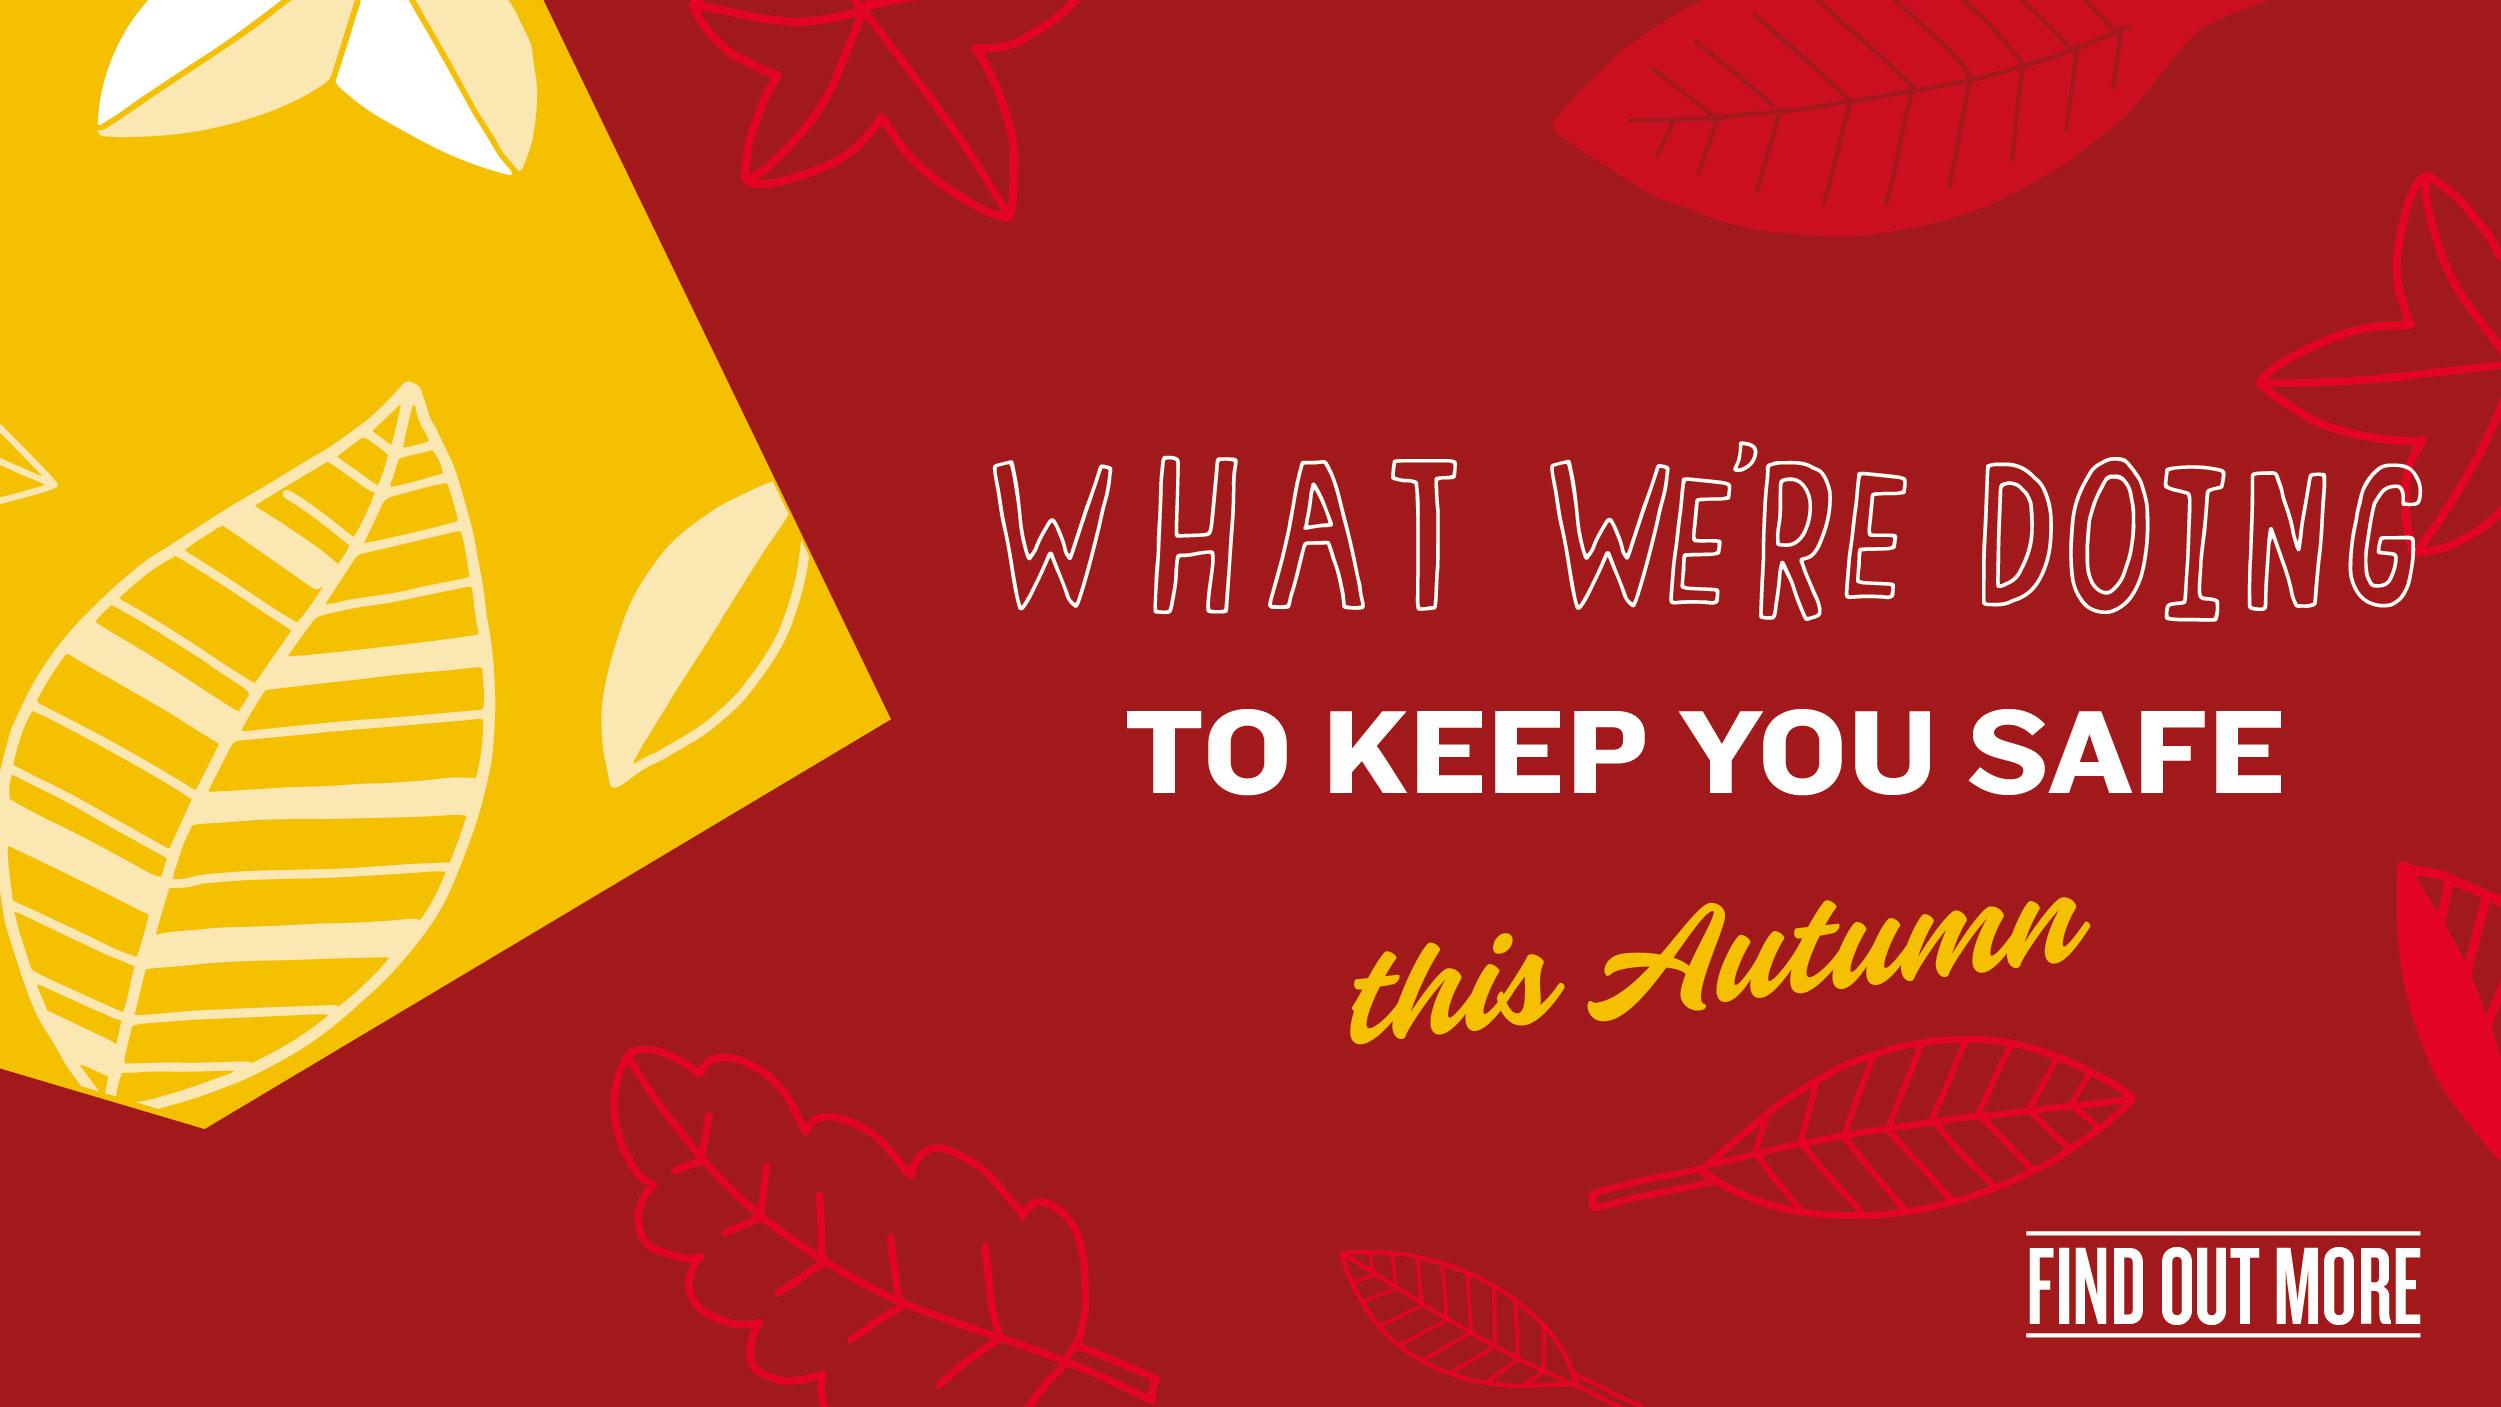 Bexleyheath_Web_Slide_Autumn